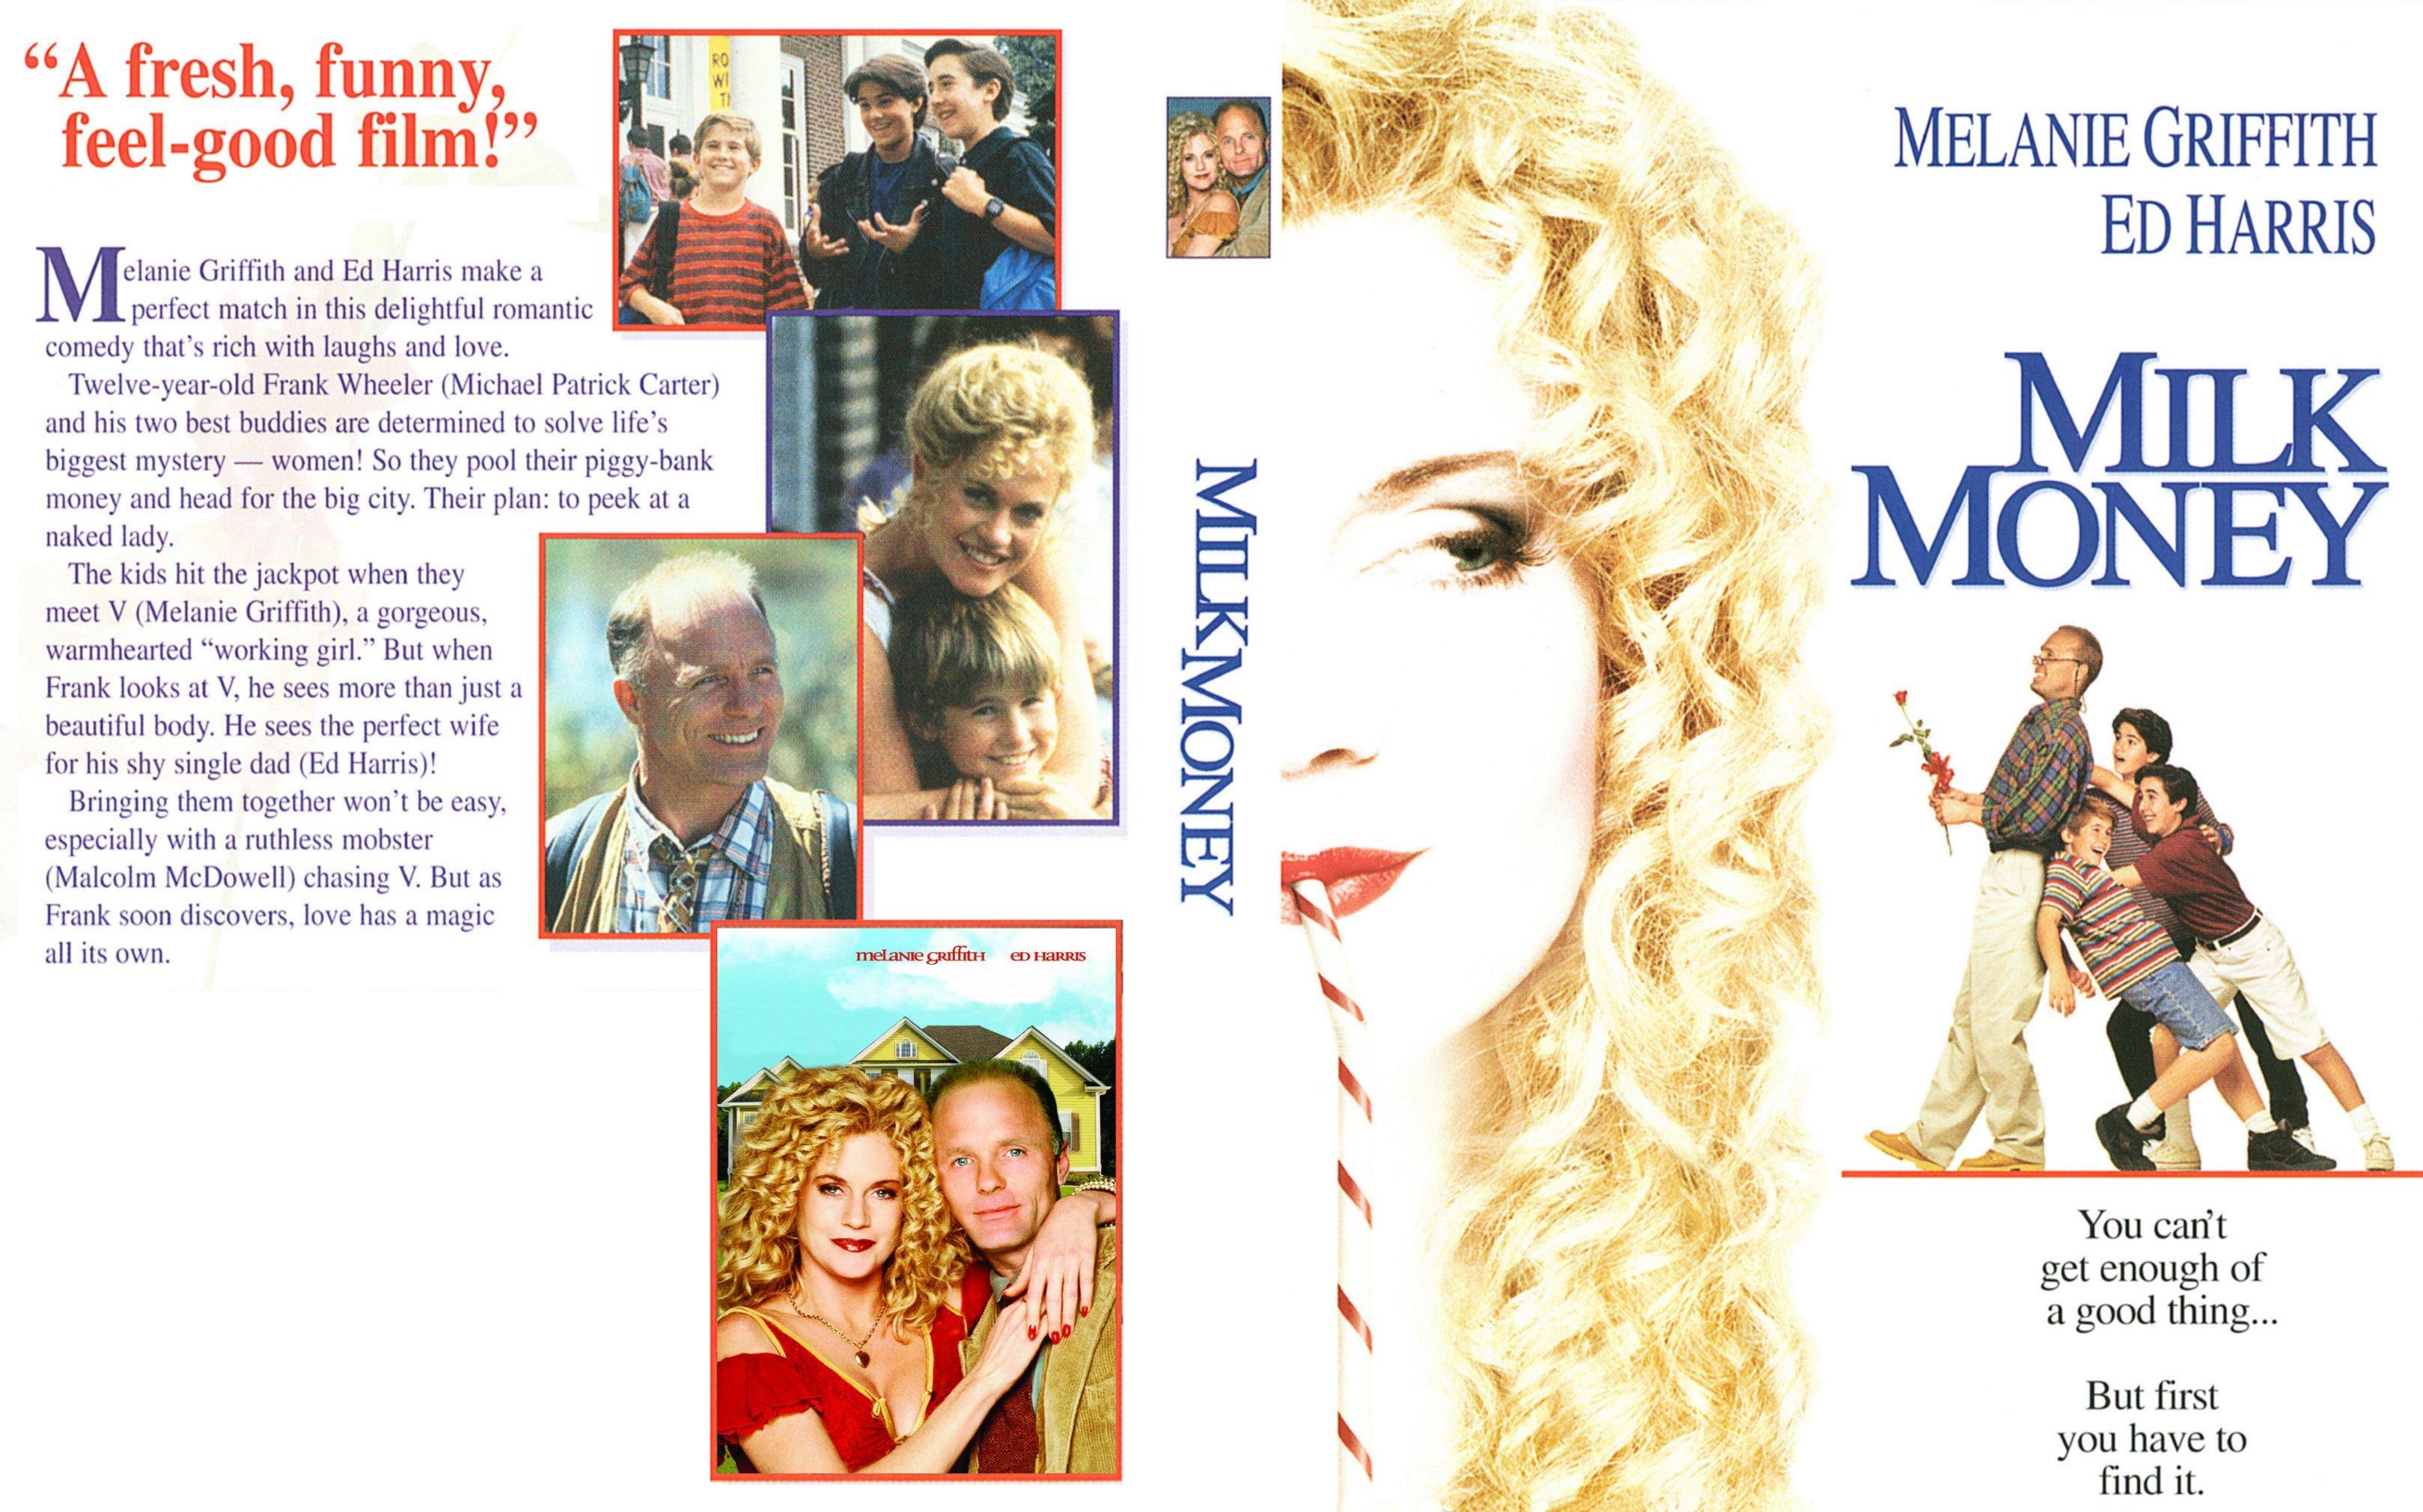 milk money 1994 movie